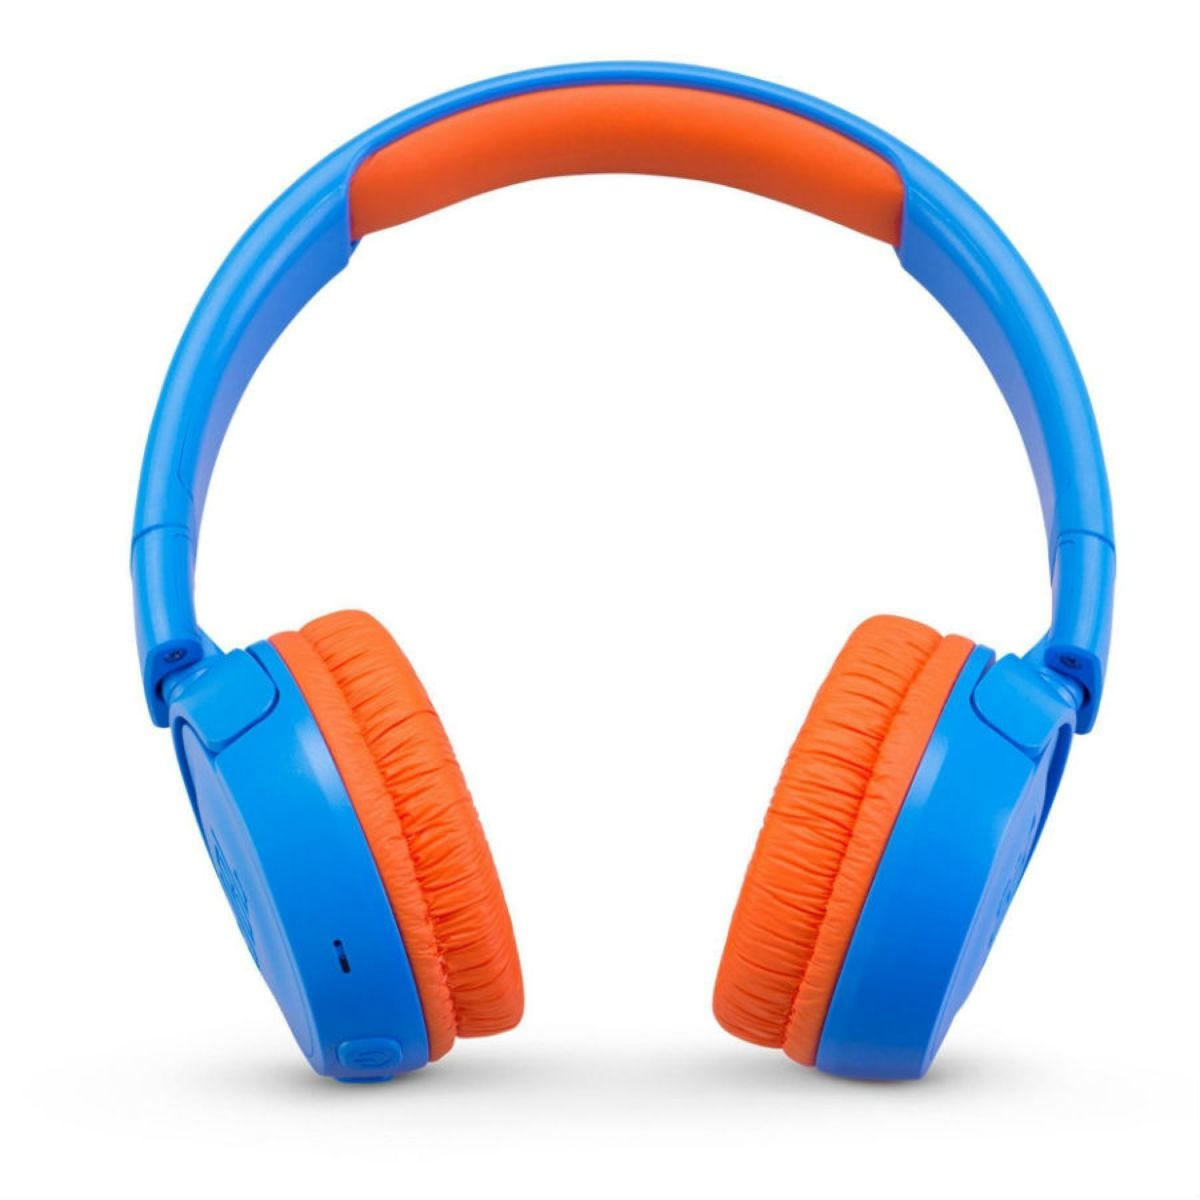 JBL JR300 Kids' Portable On-Ear Headphones - Blue/Orange